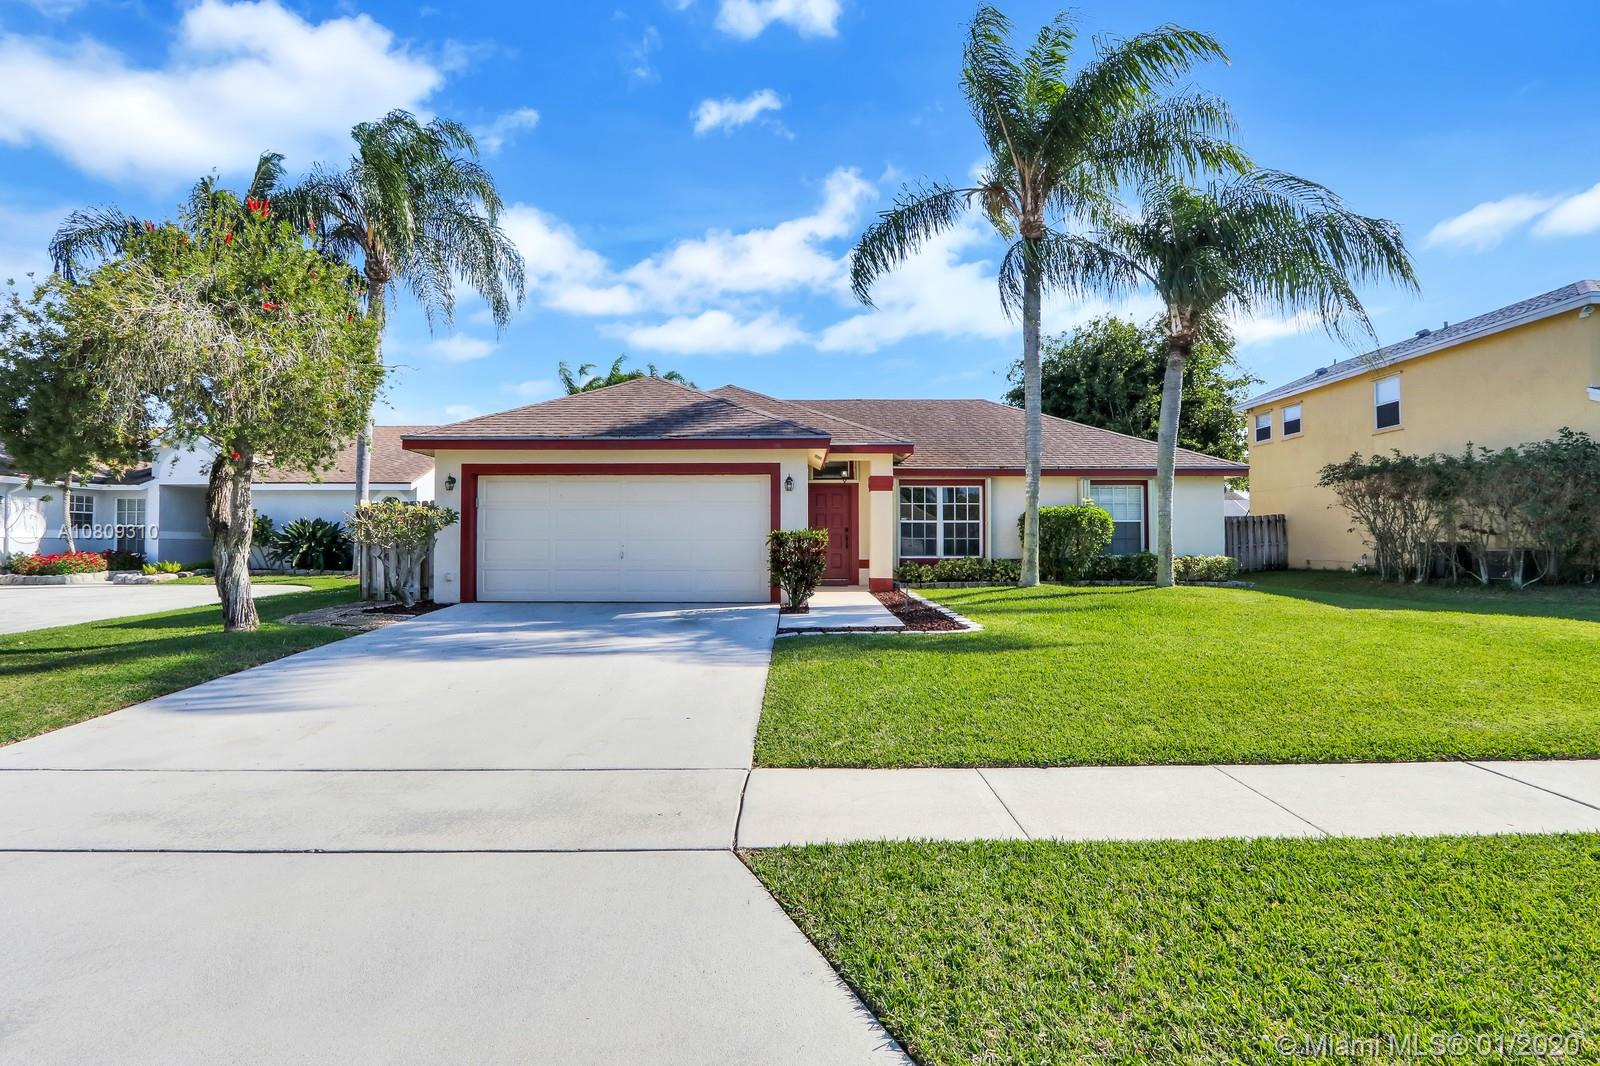 9005 Paragon Way, Boynton Beach, FL 33472 - Boynton Beach, FL real estate listing